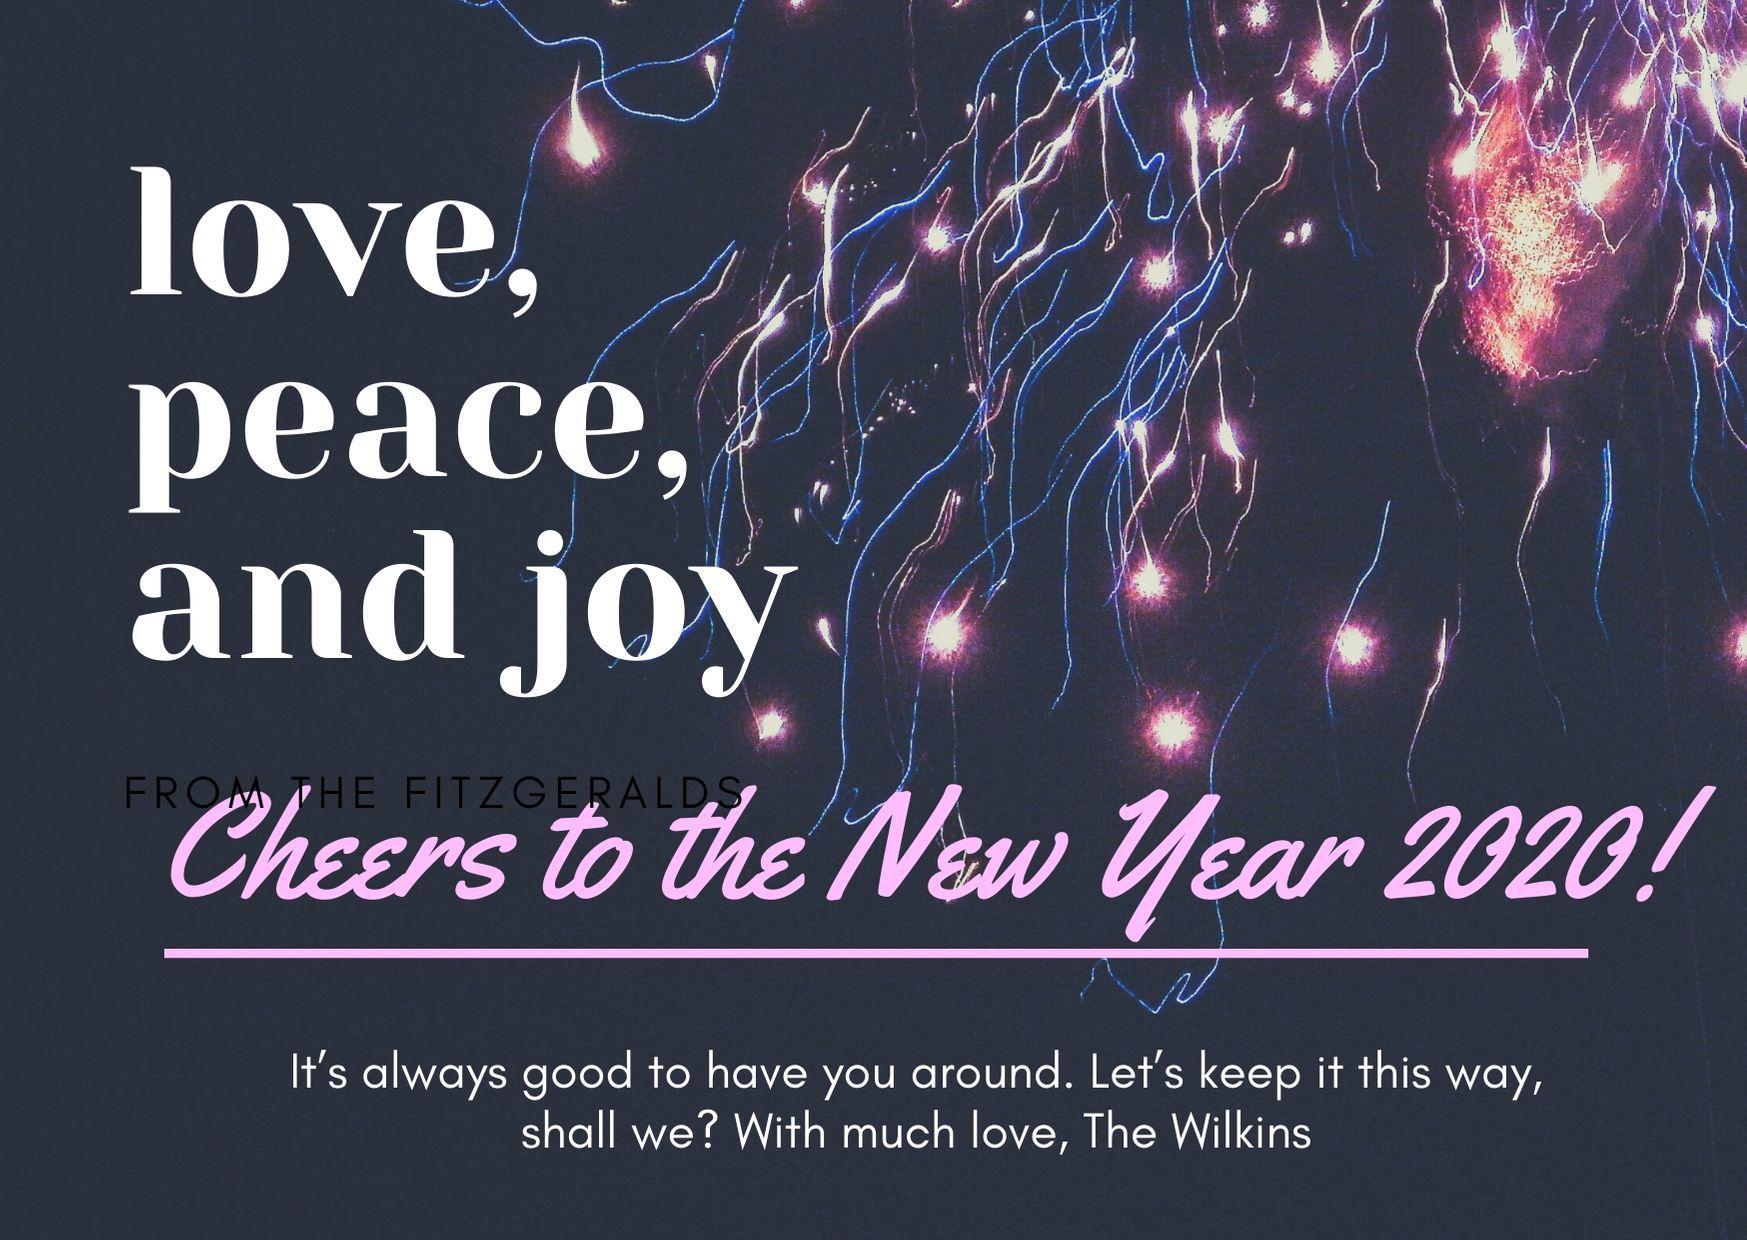 New Year Eve Celebration 2020 New Year S Eve Celebrations New Year 2020 Happy New Year 2020